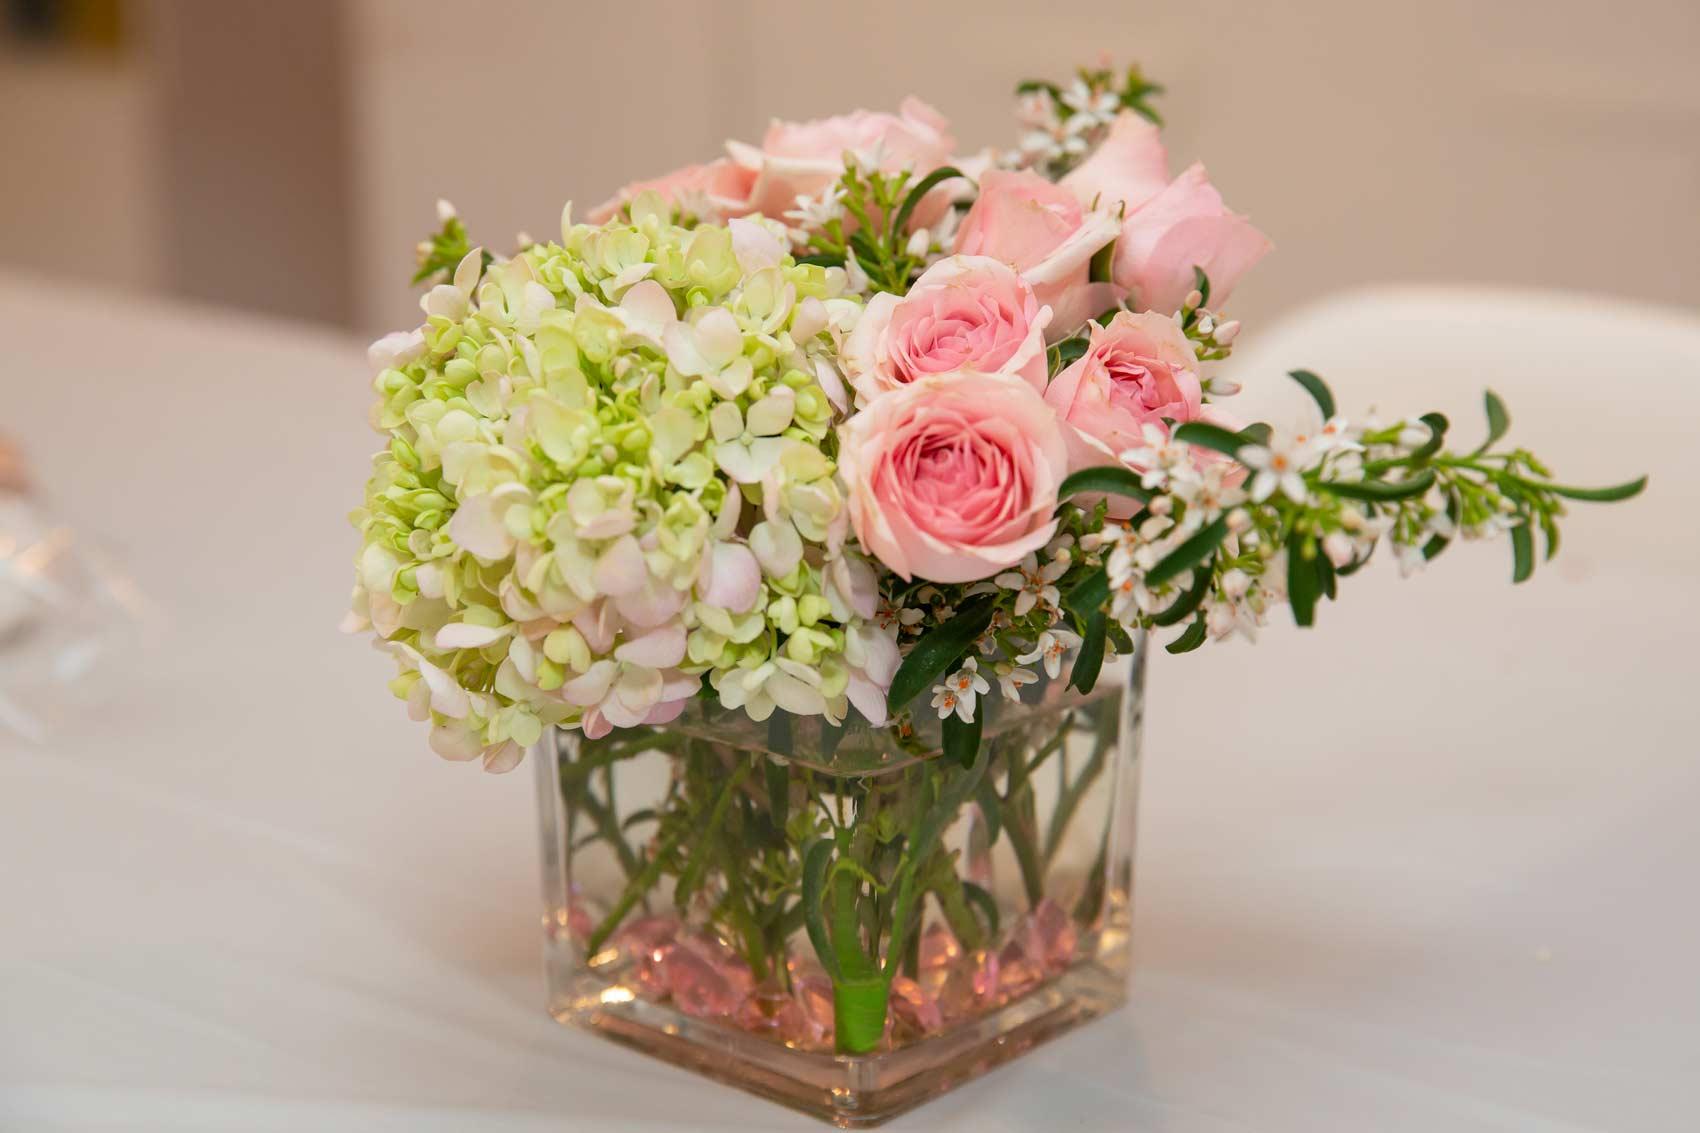 Flower arrangements I purchased, created by    Sharon Flower Designs LA